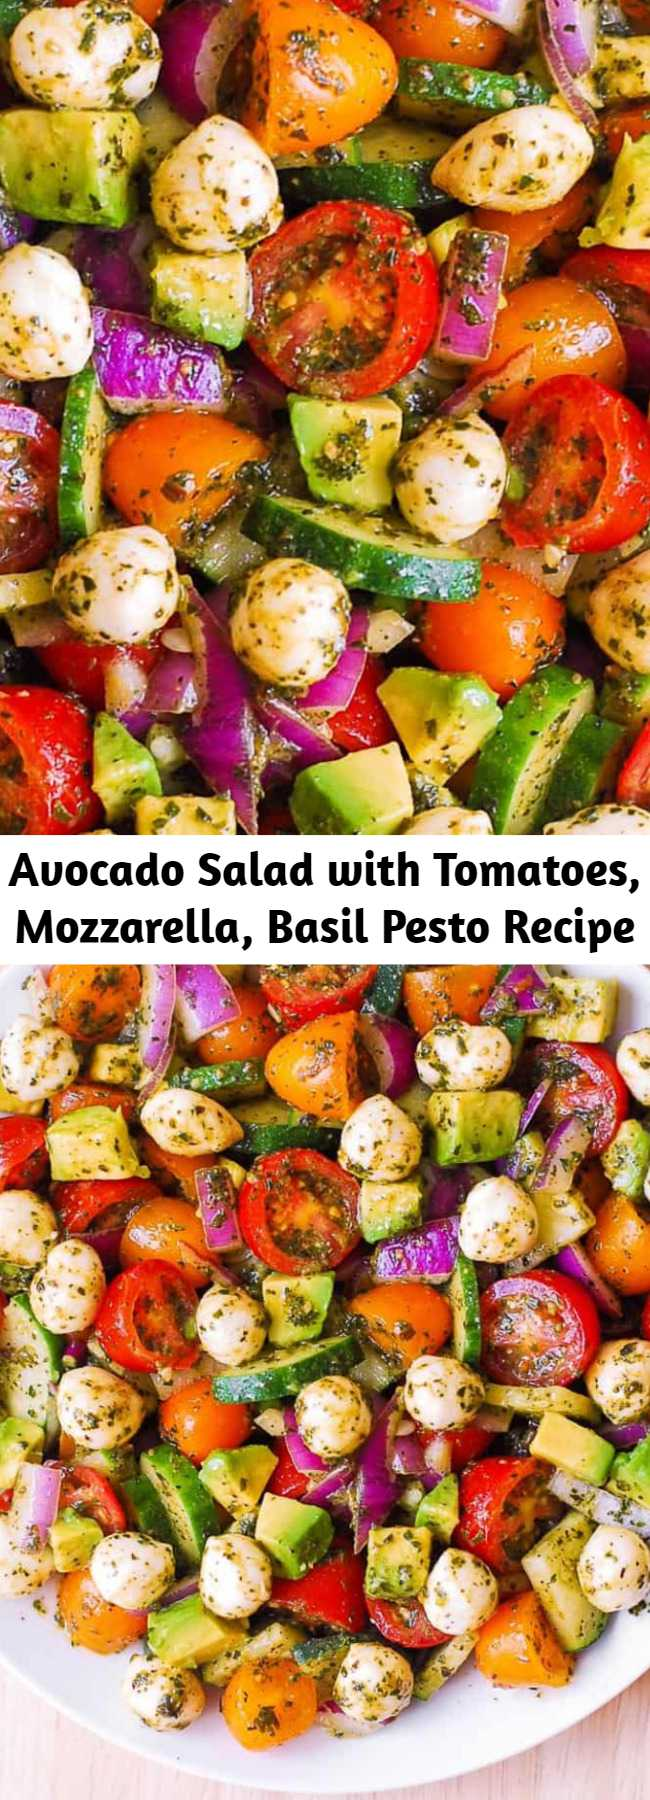 Avocado Salad with Tomatoes, Mozzarella, Basil Pesto Recipe - Healthy and delicious Spring and Summer salad: Avocado Salad with Tomatoes, Mozzarella, Basil Pesto.  Simple recipe that uses fresh ingredients: tomatoes, cucumber, avocado, fresh small Mozzarella cheese balls, red onions, and basil pesto dressing. #easy #salad #easysalad #Spring #Summer #pestosalad #tomatosalad #cucumbersalad #tomatoes #cucumber #avocado #avocadosalad #healthysalad